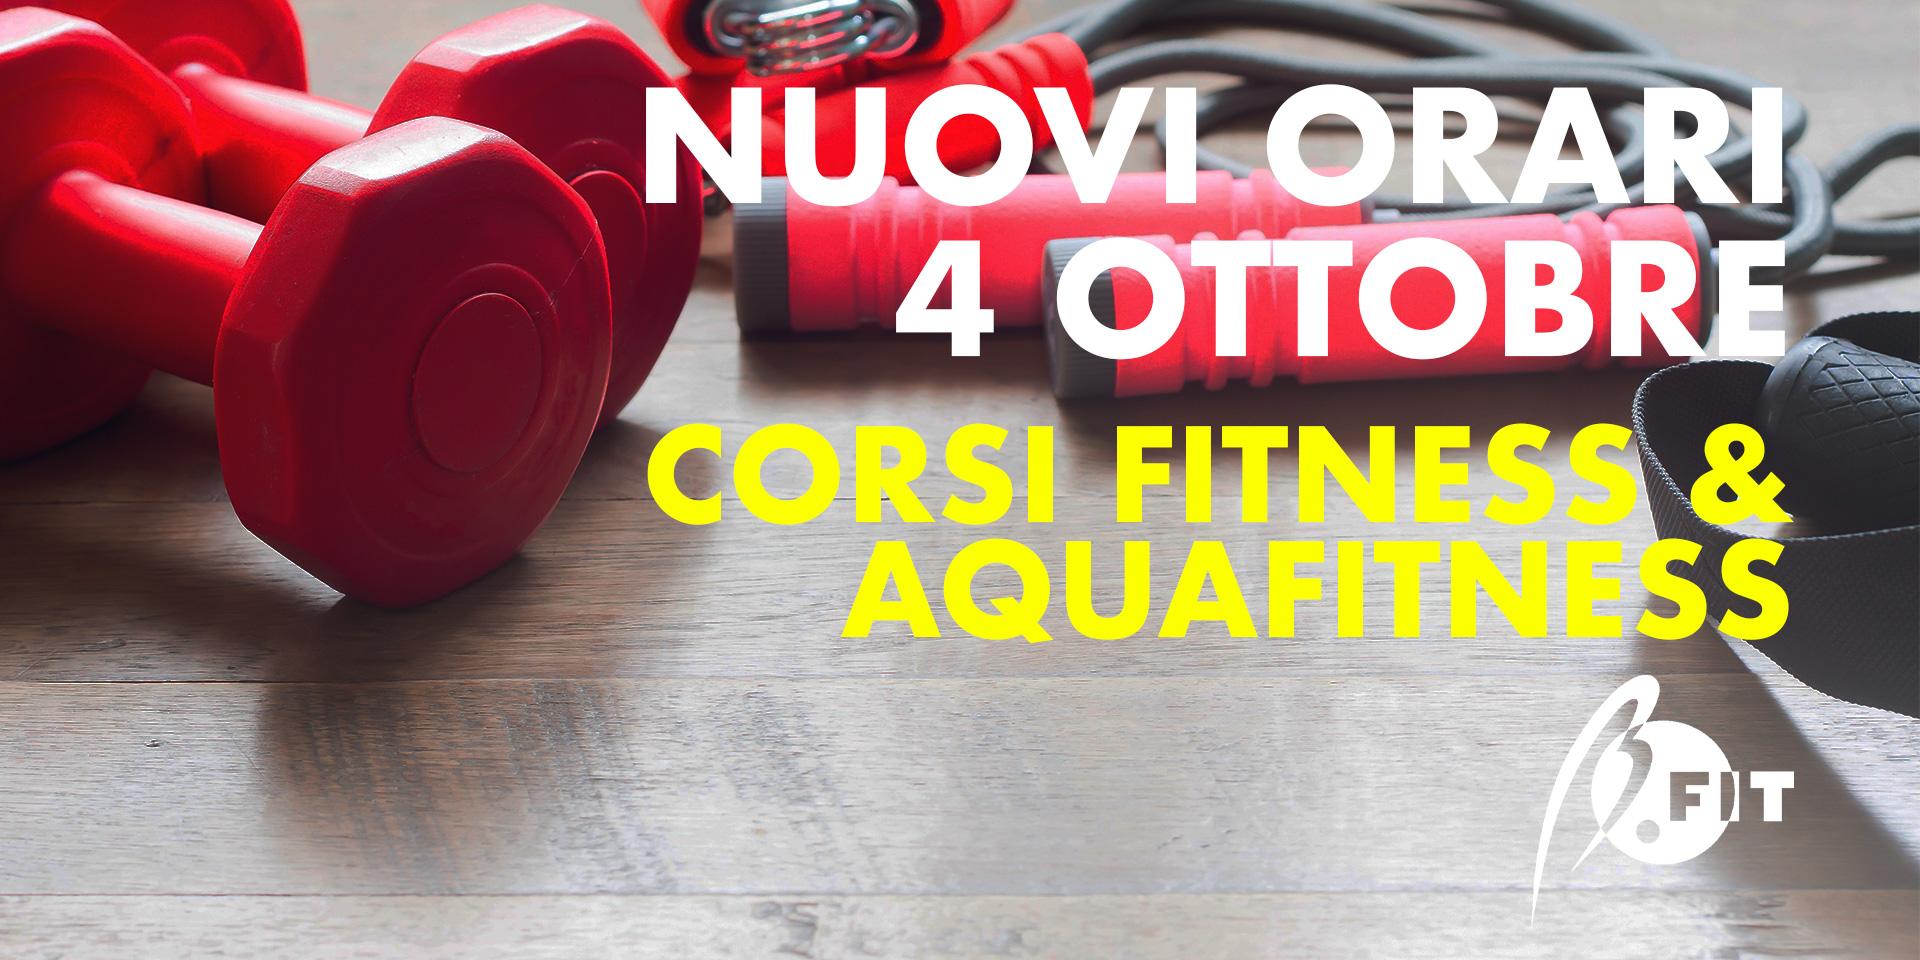 Banner nuovi orari corsi fitness&aquafitness dal 04/10/21